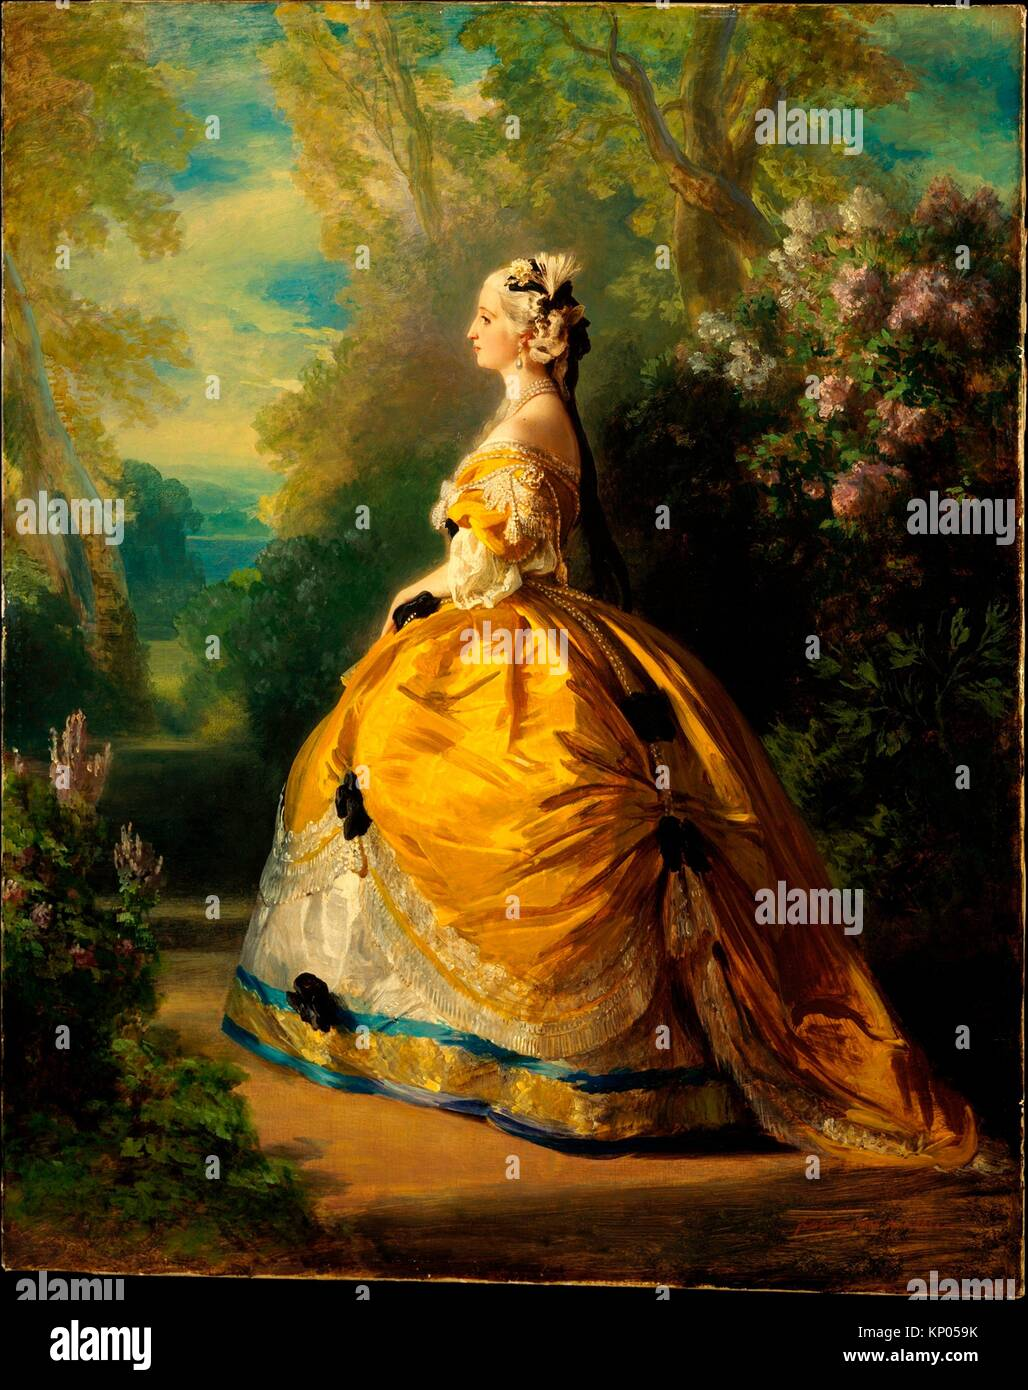 The Empress And Death Antique Tarot Cards: Eugenie De Montijo Stock Photos & Eugenie De Montijo Stock